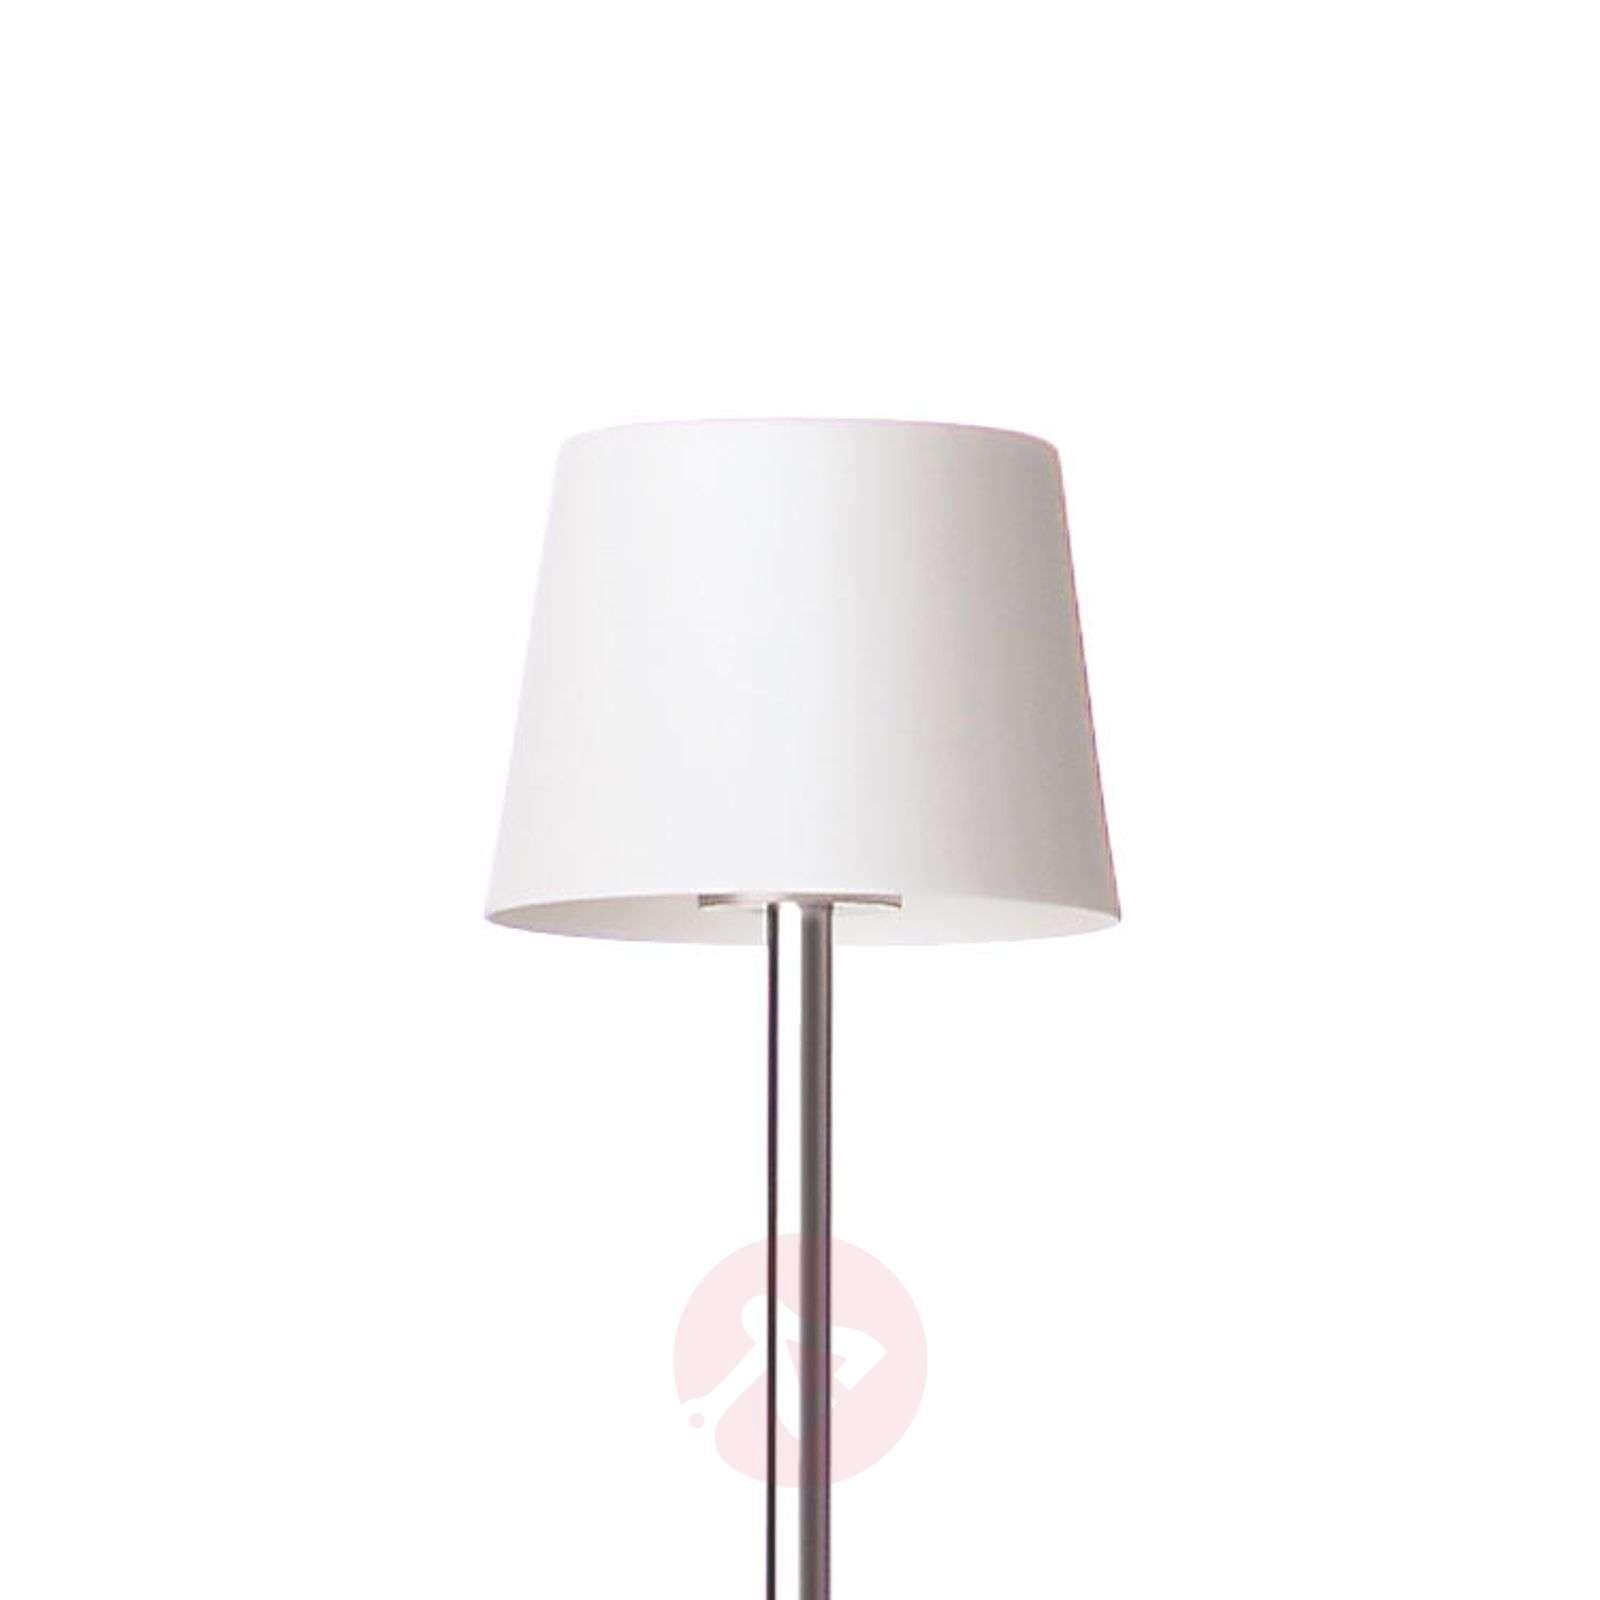 Timeless designer floor lamp Cut-1071029X-01